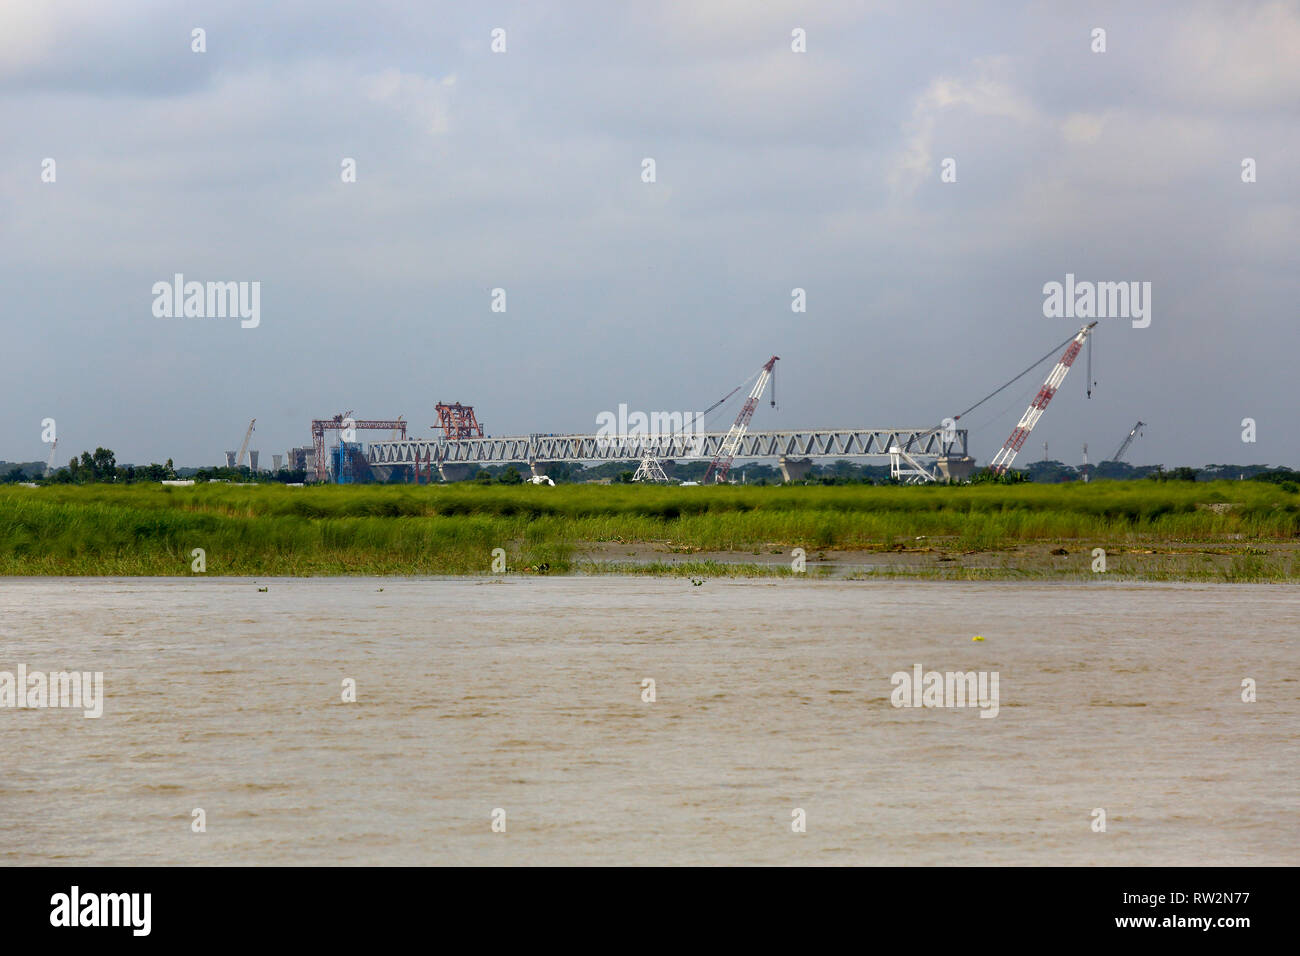 Bridge construction work in progress on the Padma River. Bangladesh. - Stock Image